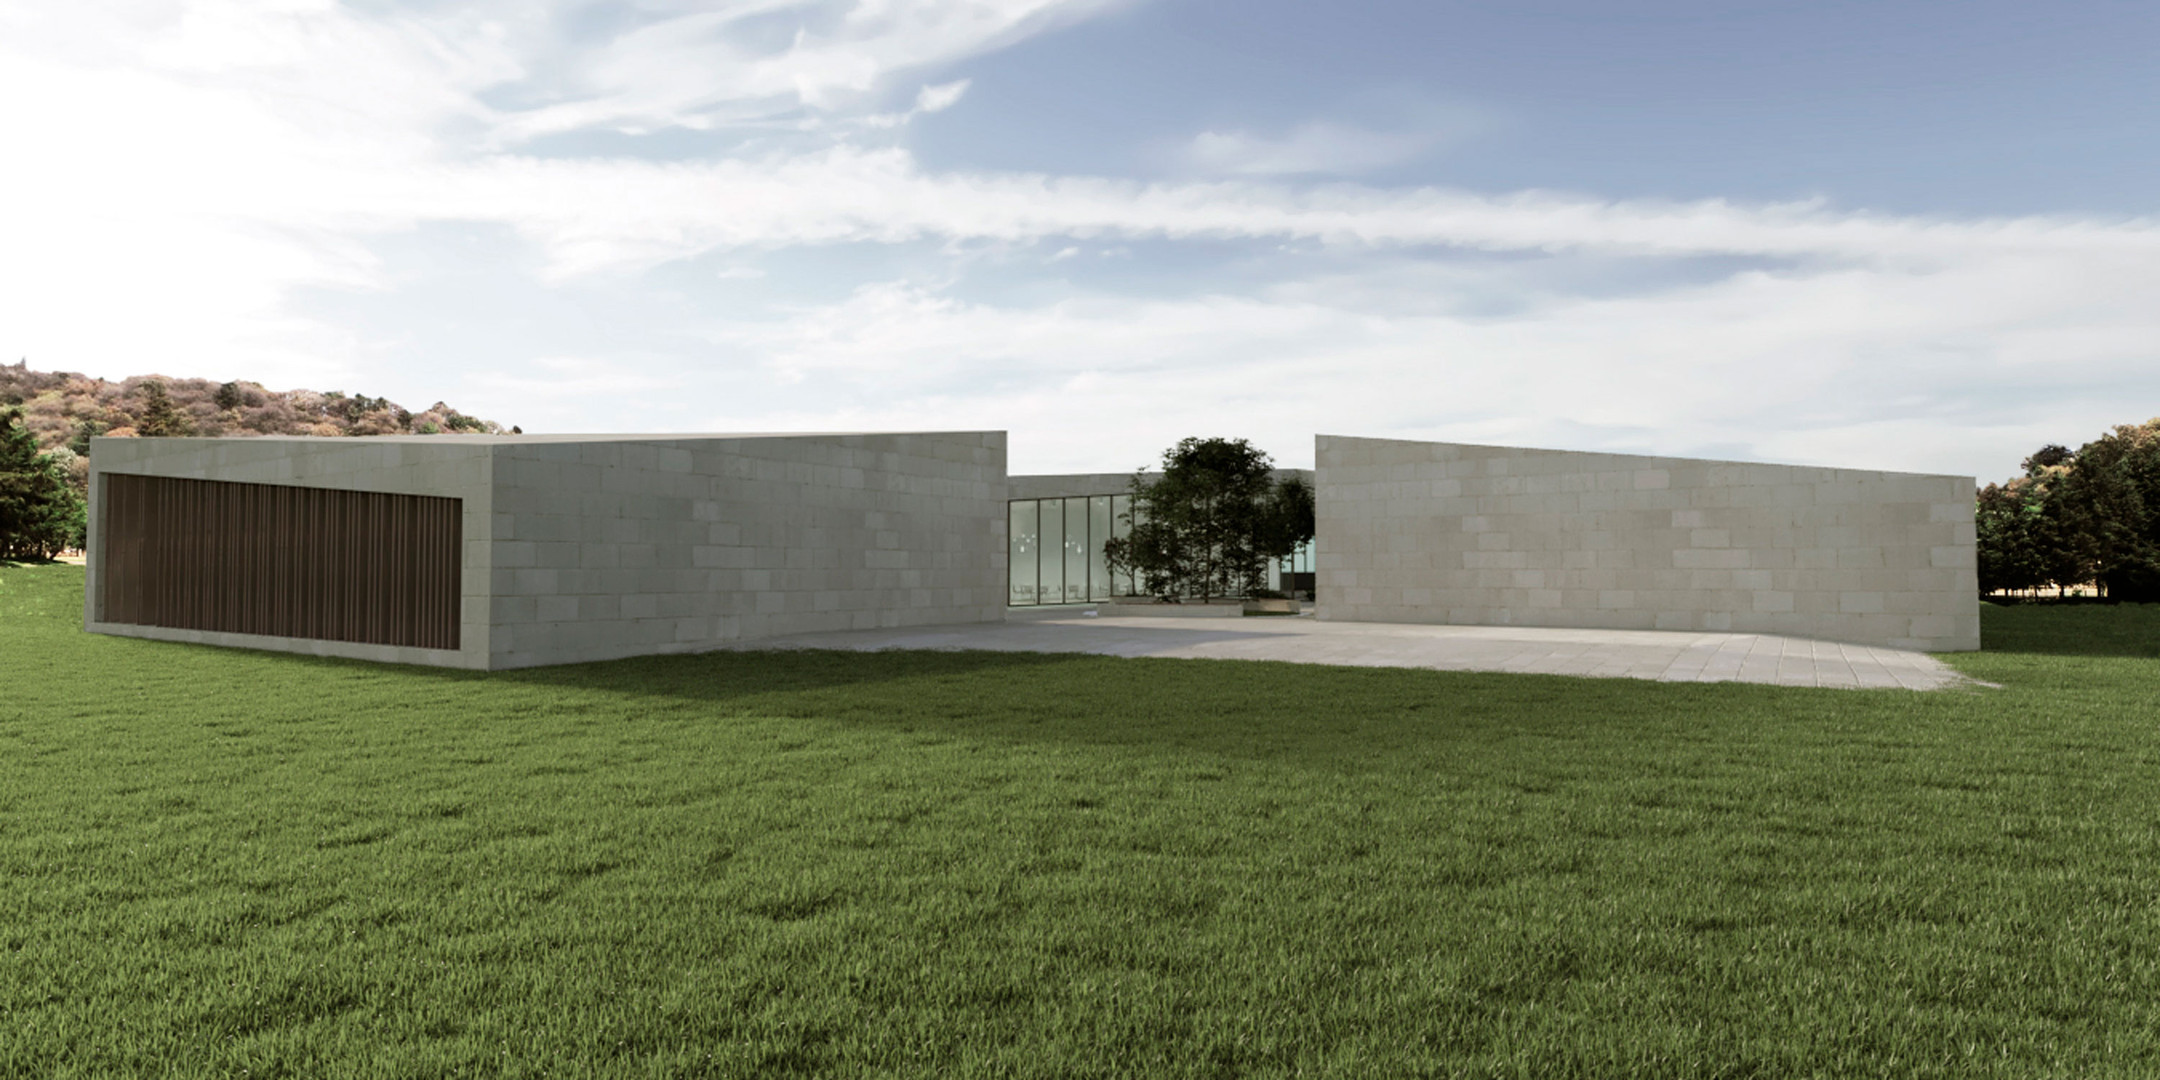 arquitectura-senmais-19.13b.03.jpg